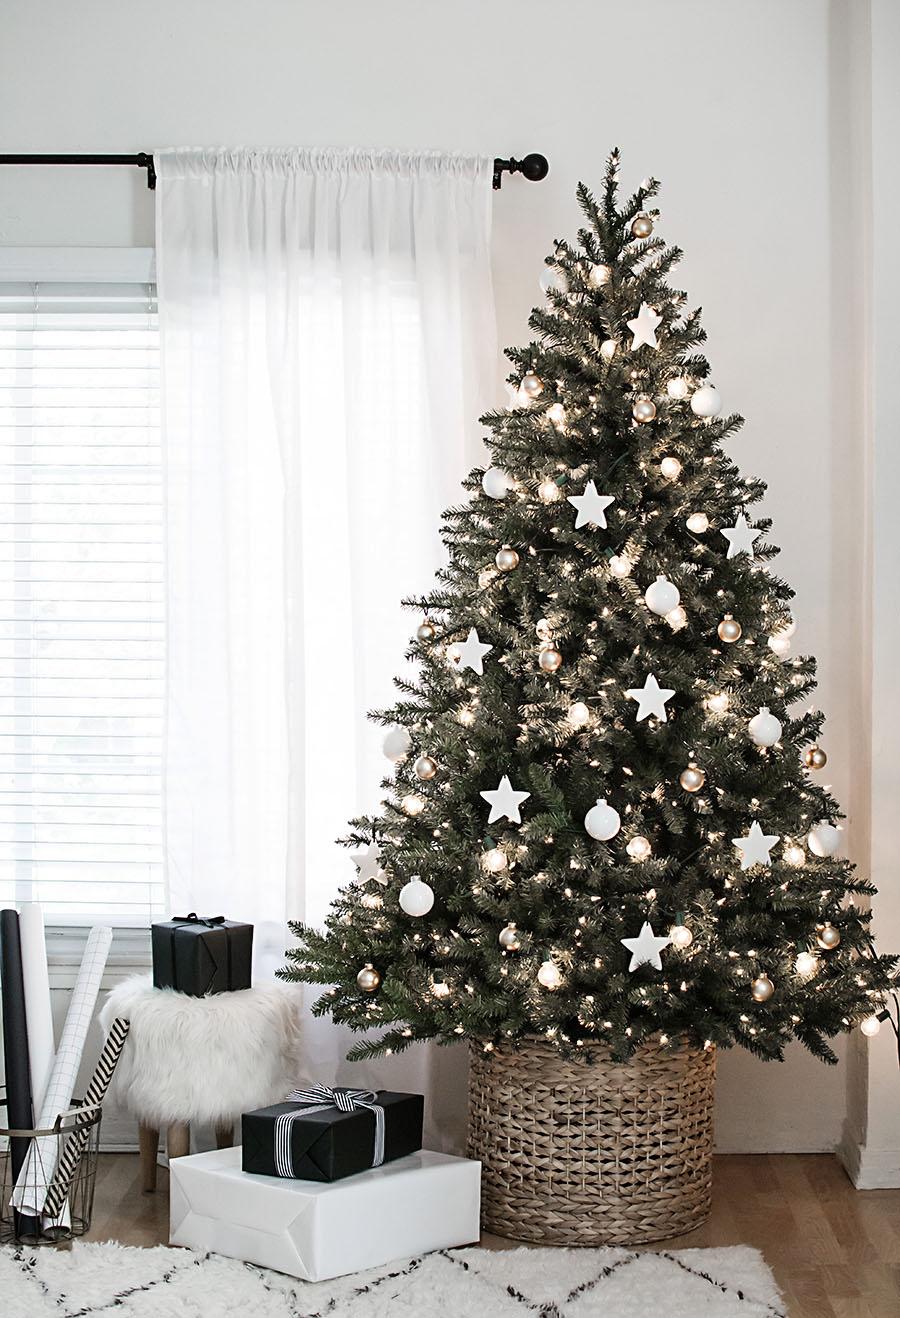 DIY Πήλινα στολίδια αστέρια για το χριστουγεννιάτικο δέντρο1